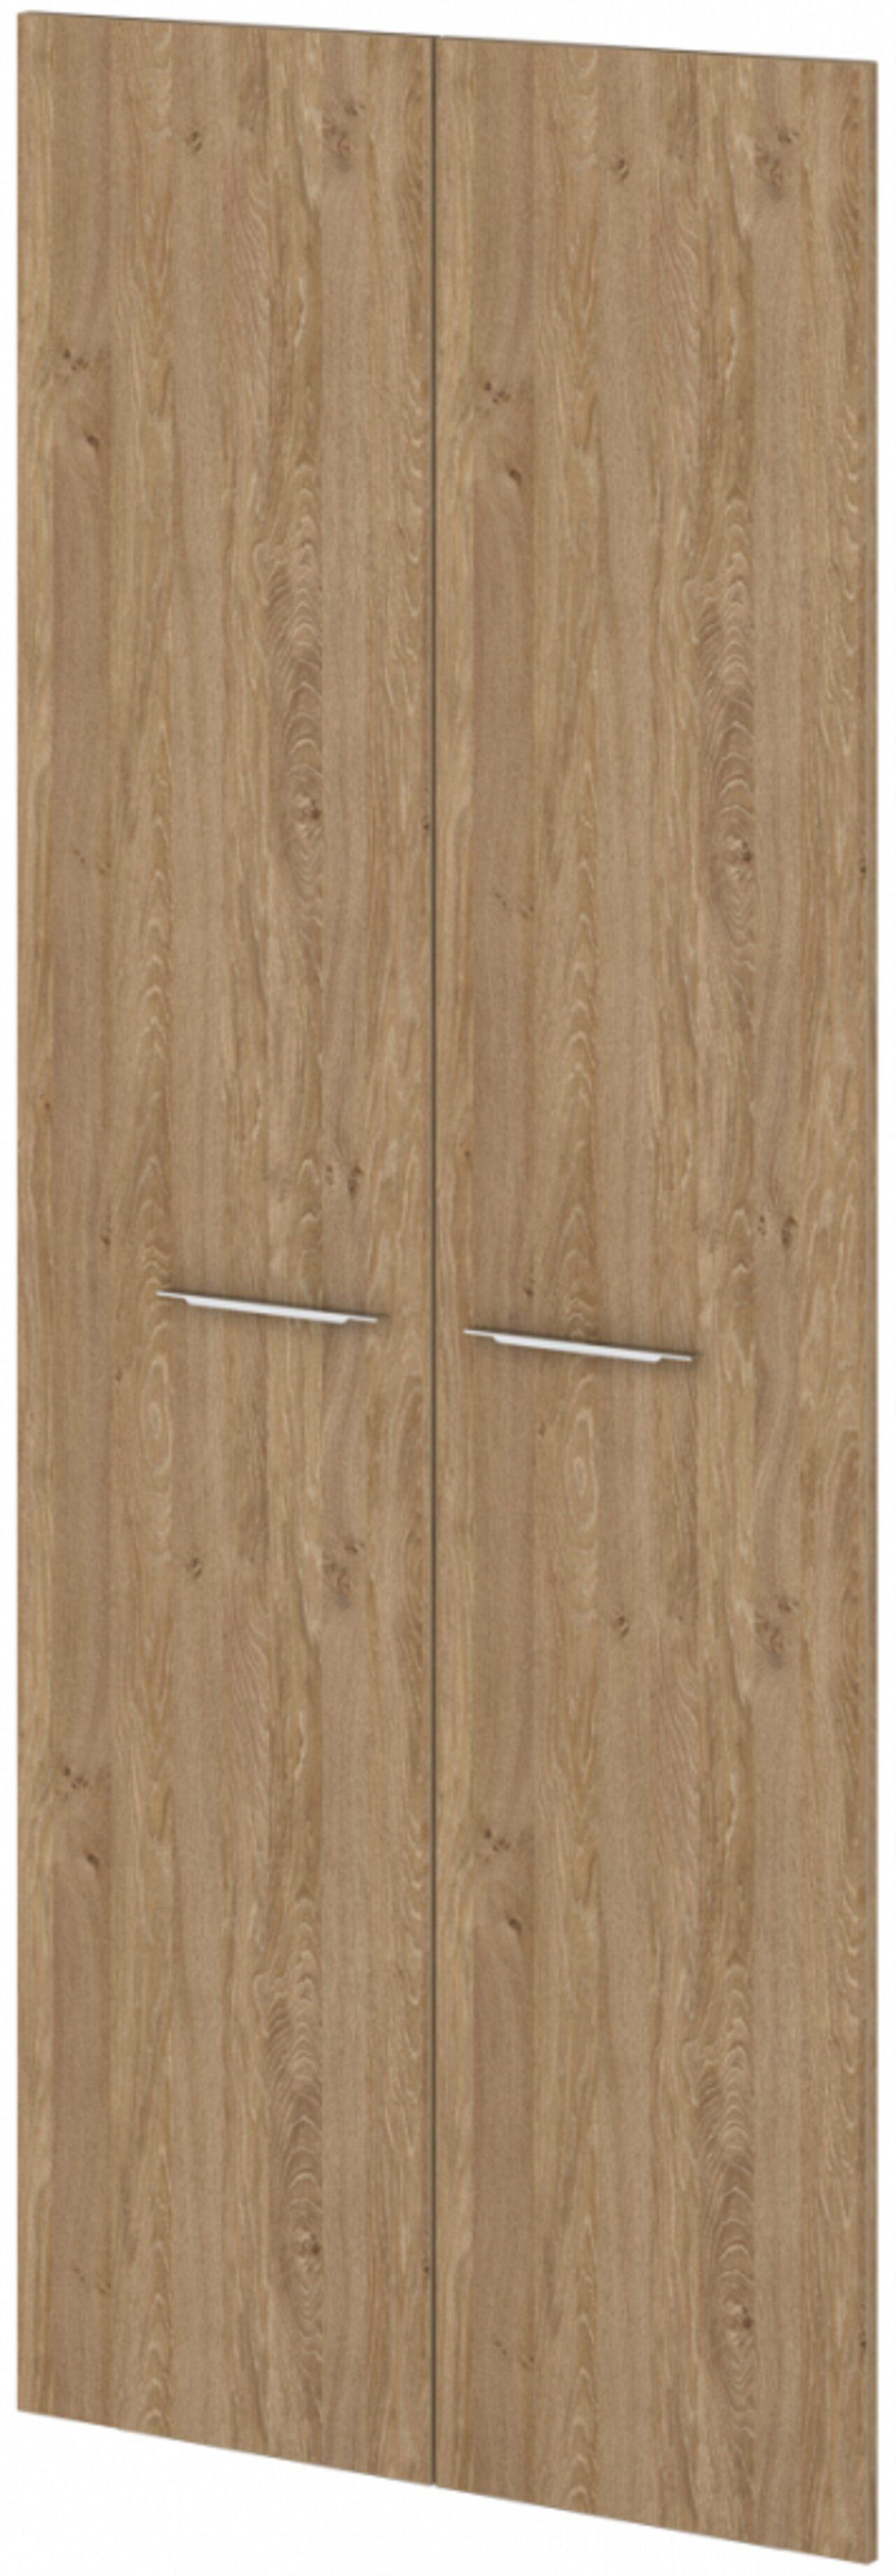 Двери ЛДСП высокие  Grandeza 2x90x221 - фото 5